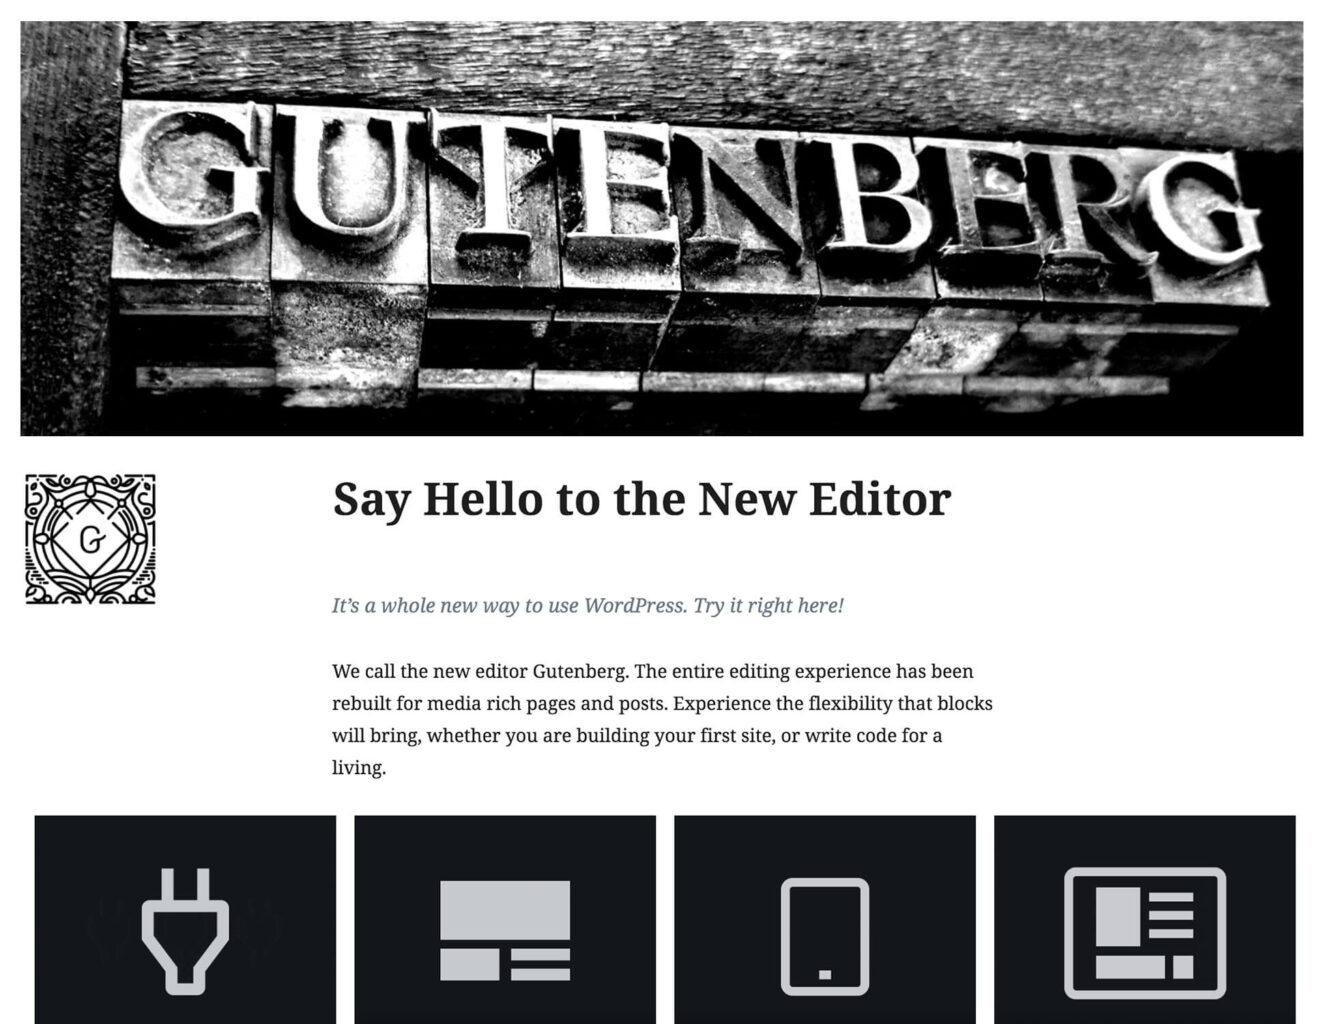 Say hello to the new WordPress editor - Gutenberg.